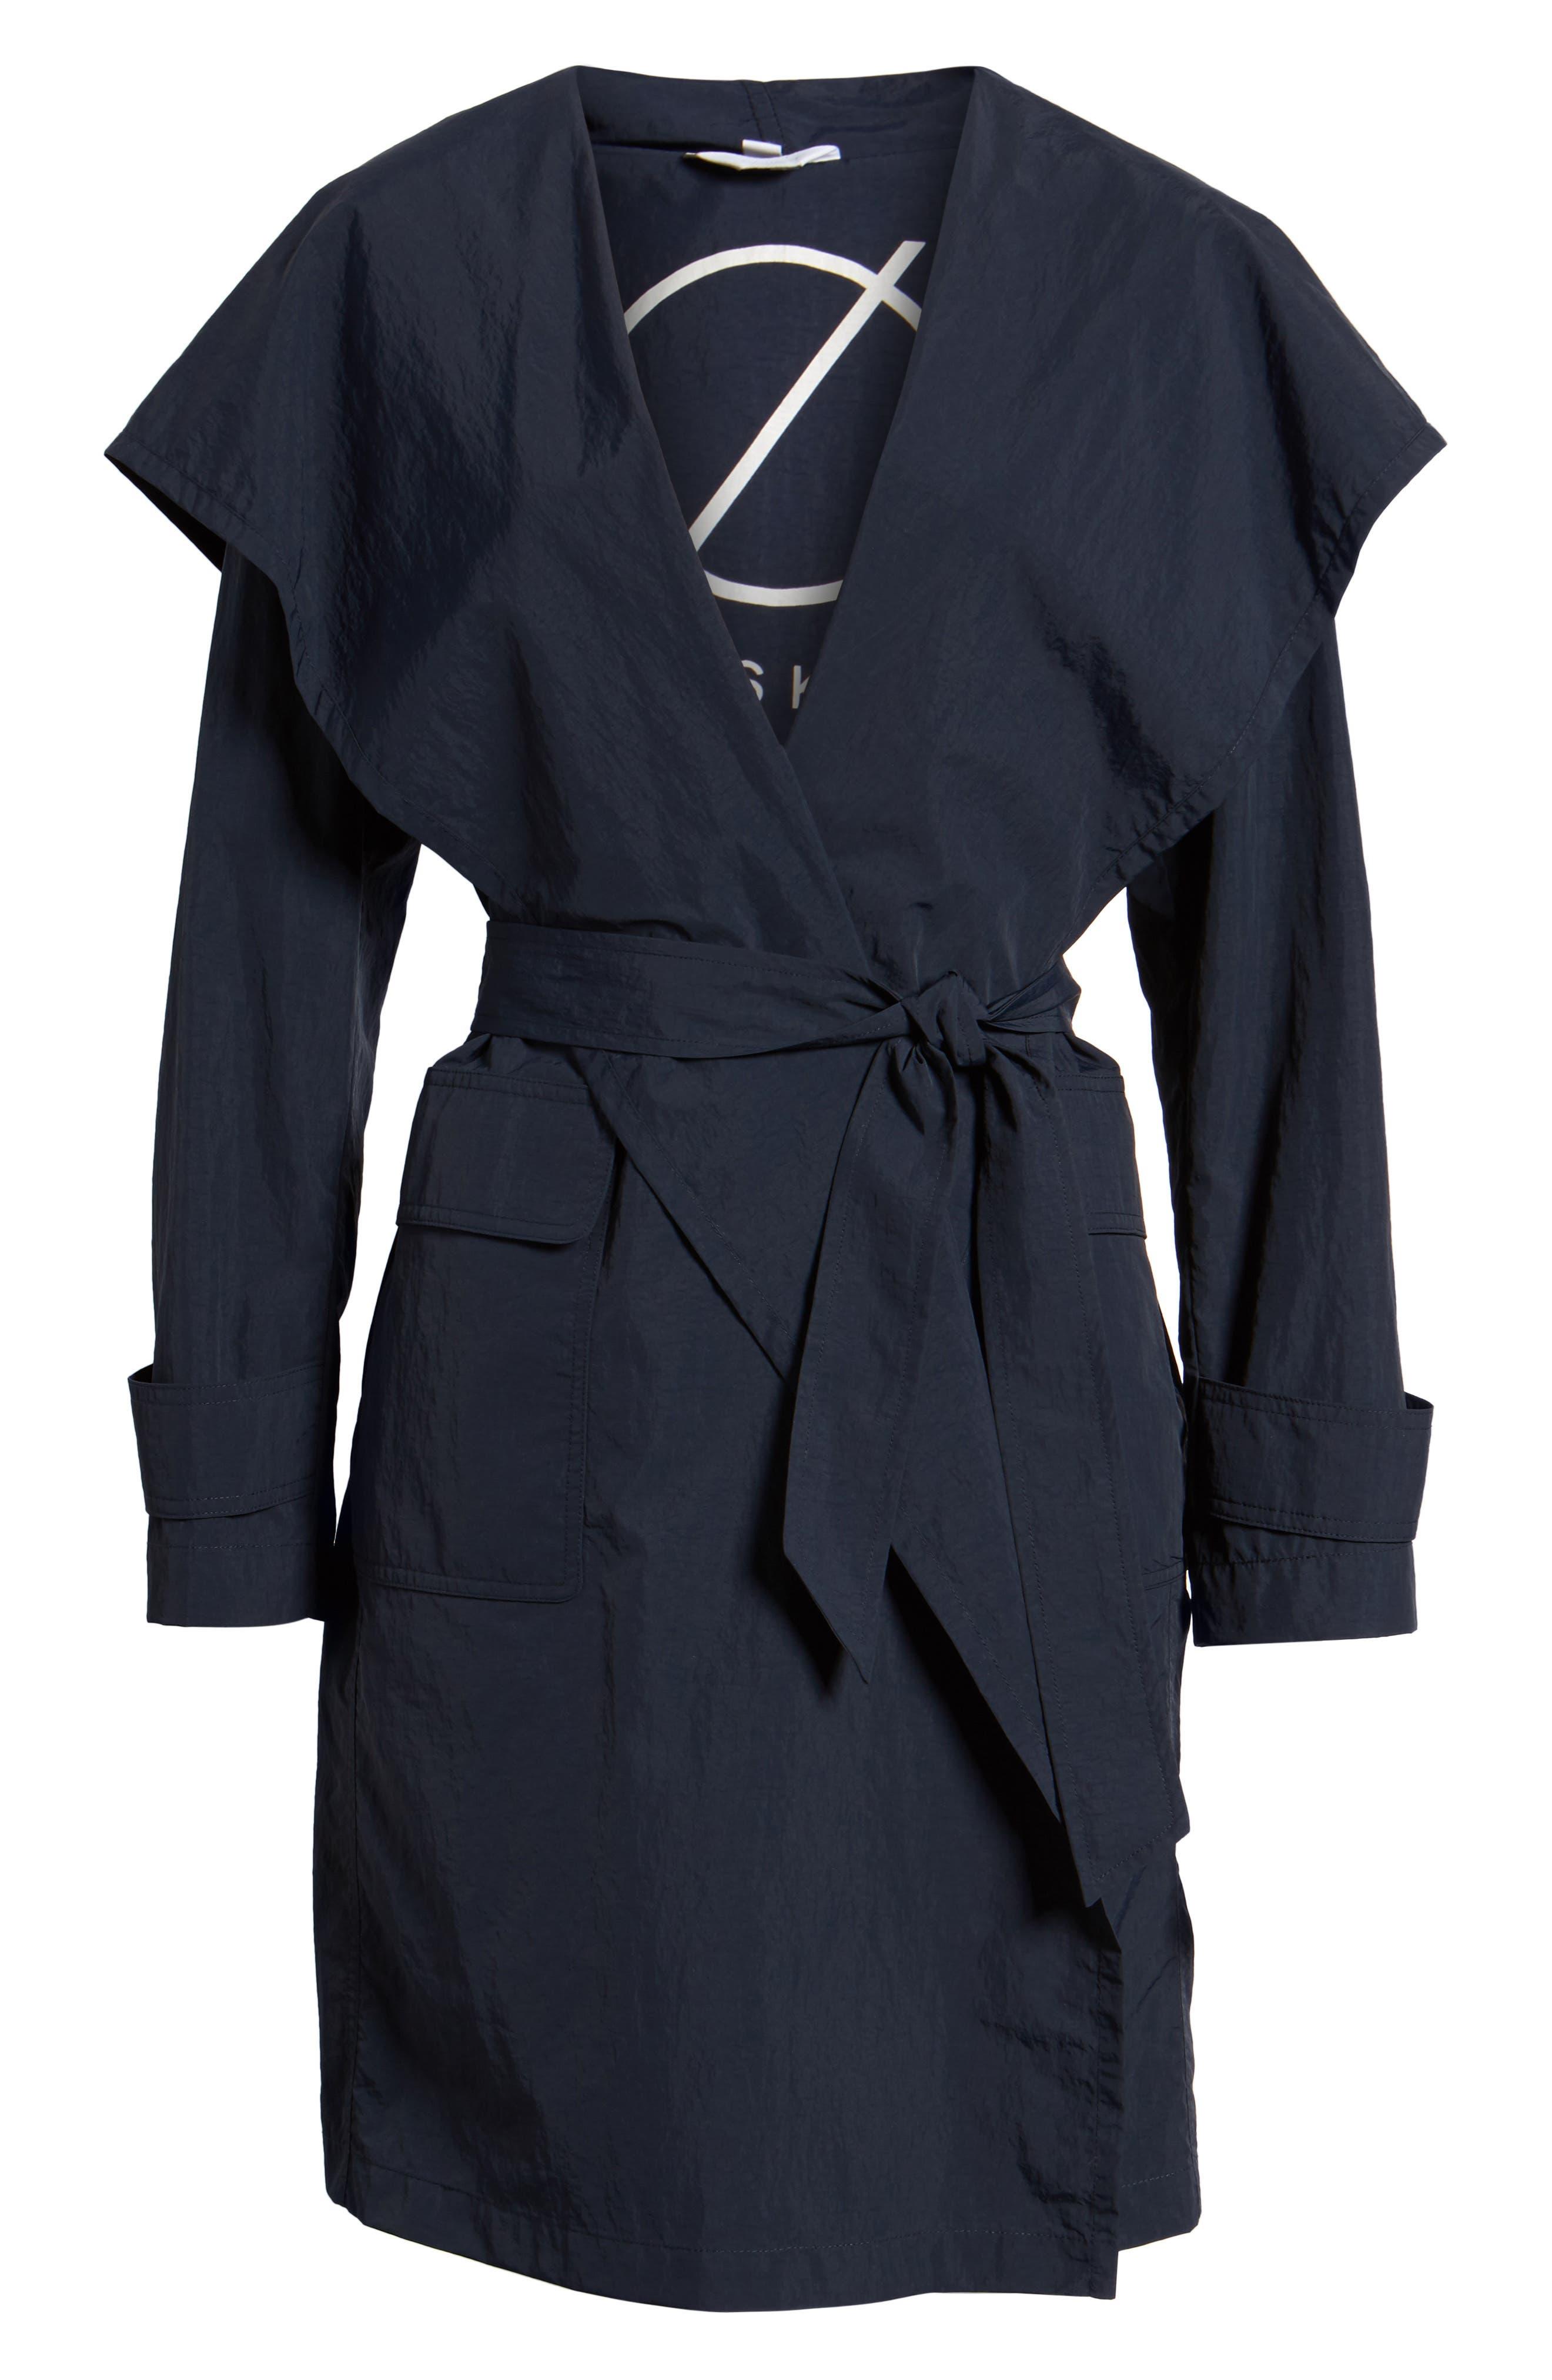 Flo Packable Hooded Raincoat,                             Alternate thumbnail 6, color,                             250